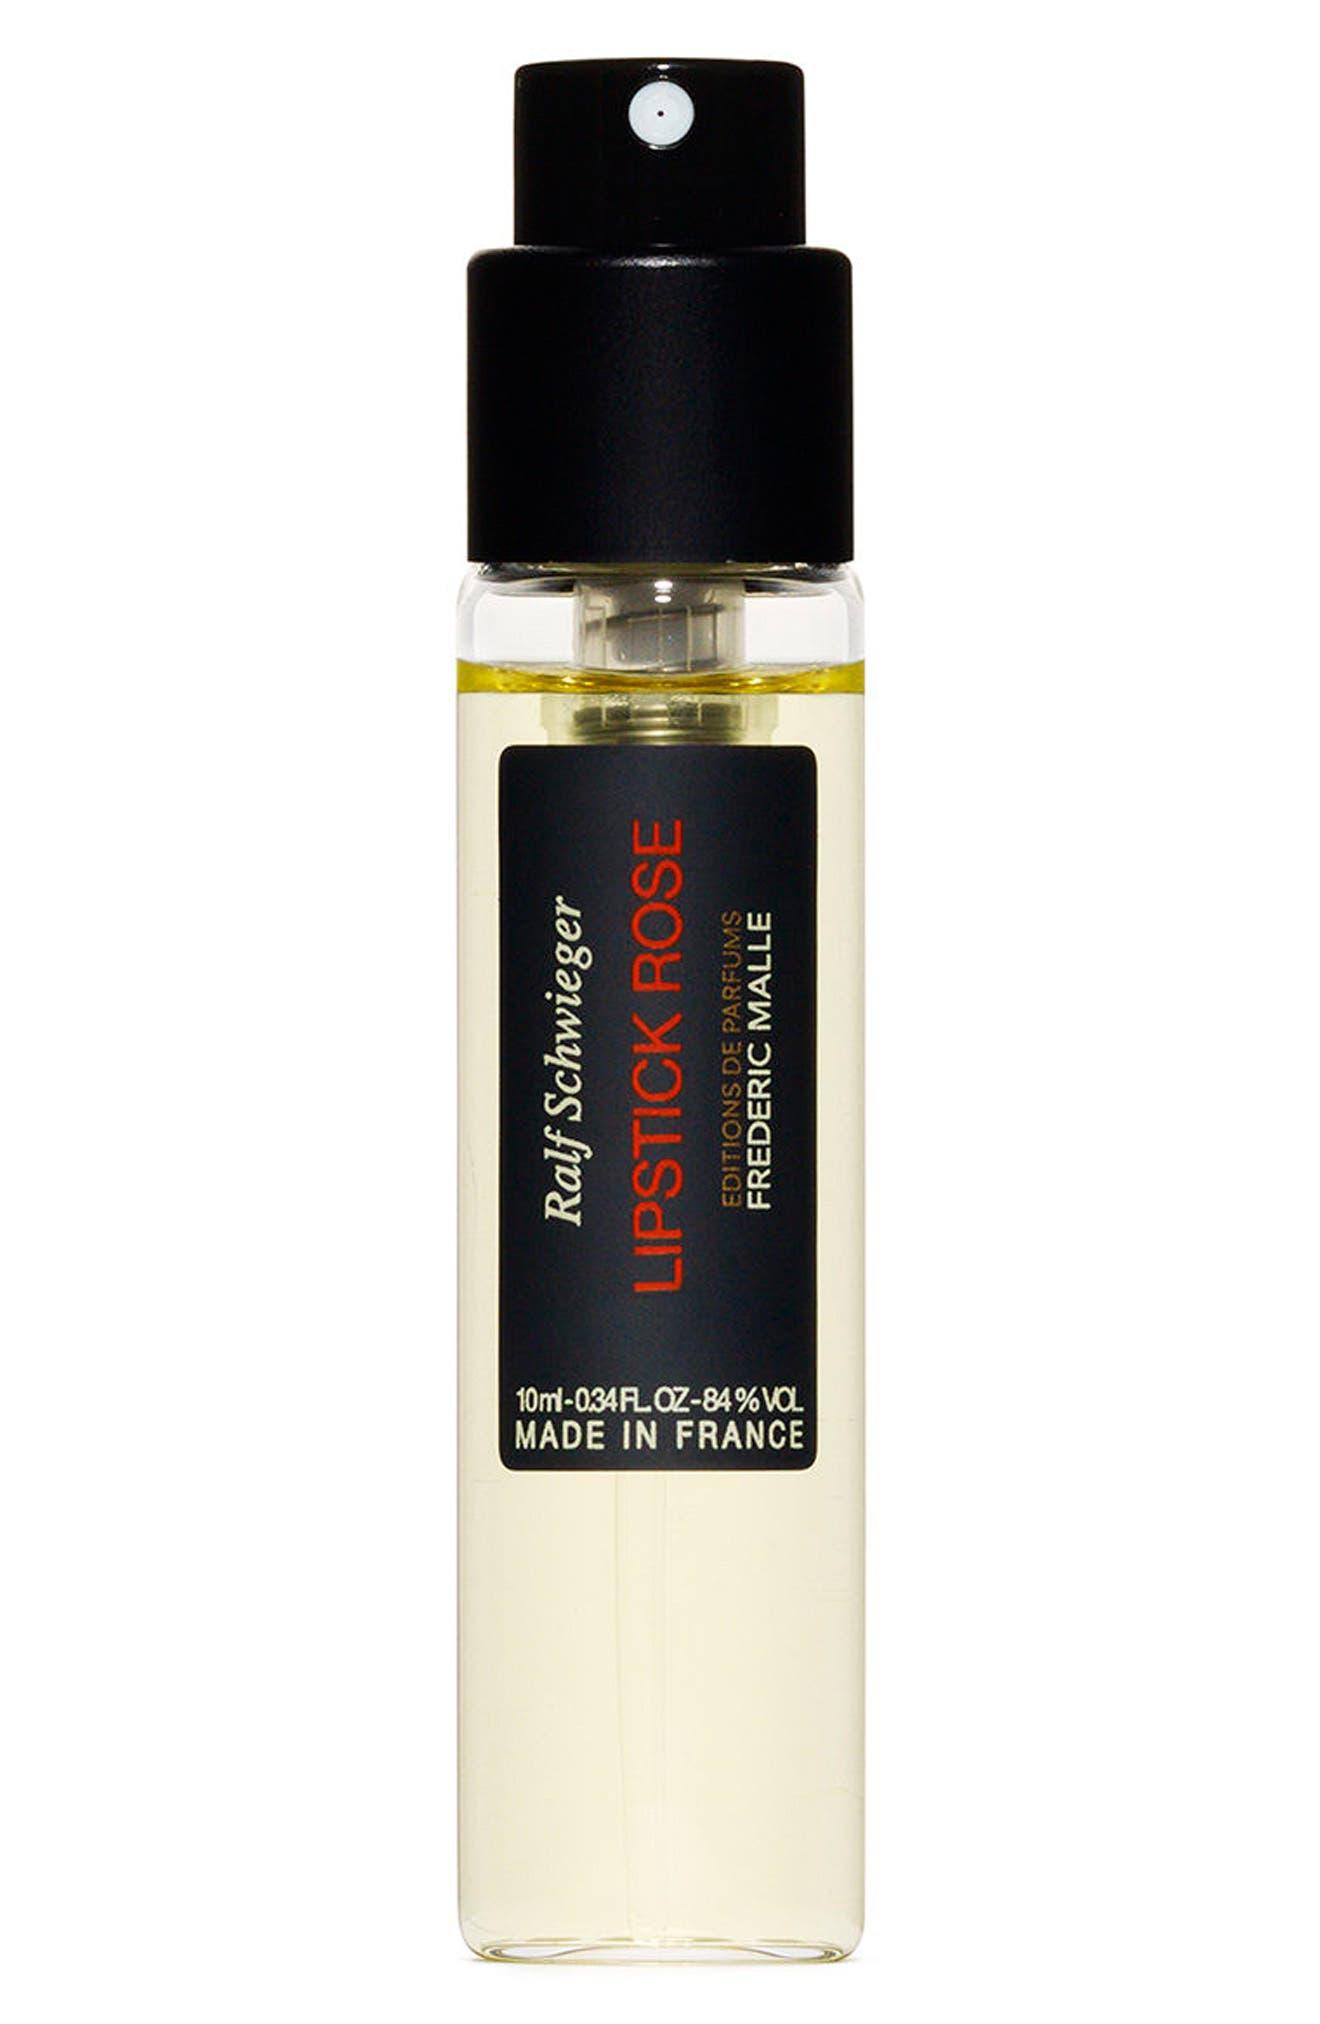 Editions de Parfums Frédéric Malle Lipstick Rose Travel Fragrance Spray,                         Main,                         color, No Color